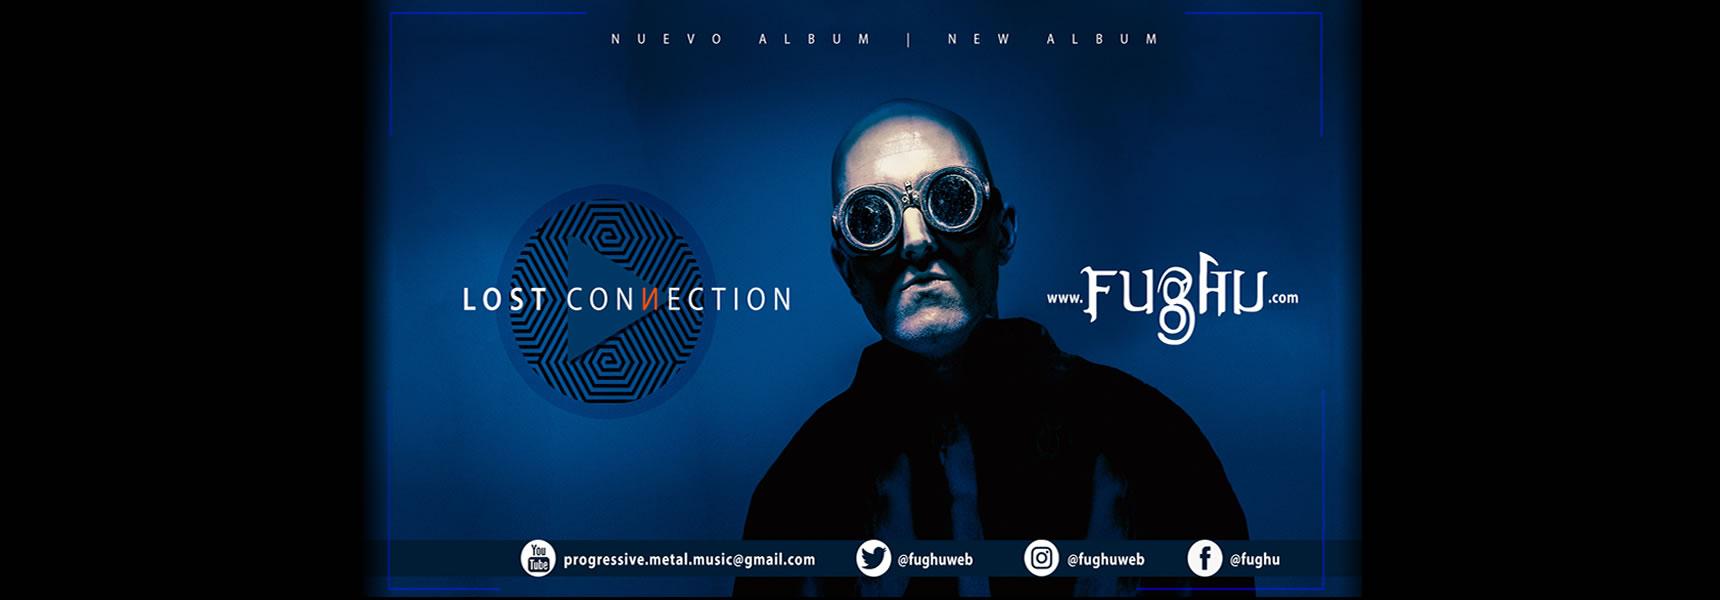 https://www.fughu.com/wp-content/uploads/2013/12/Fguhu-2020.jpg